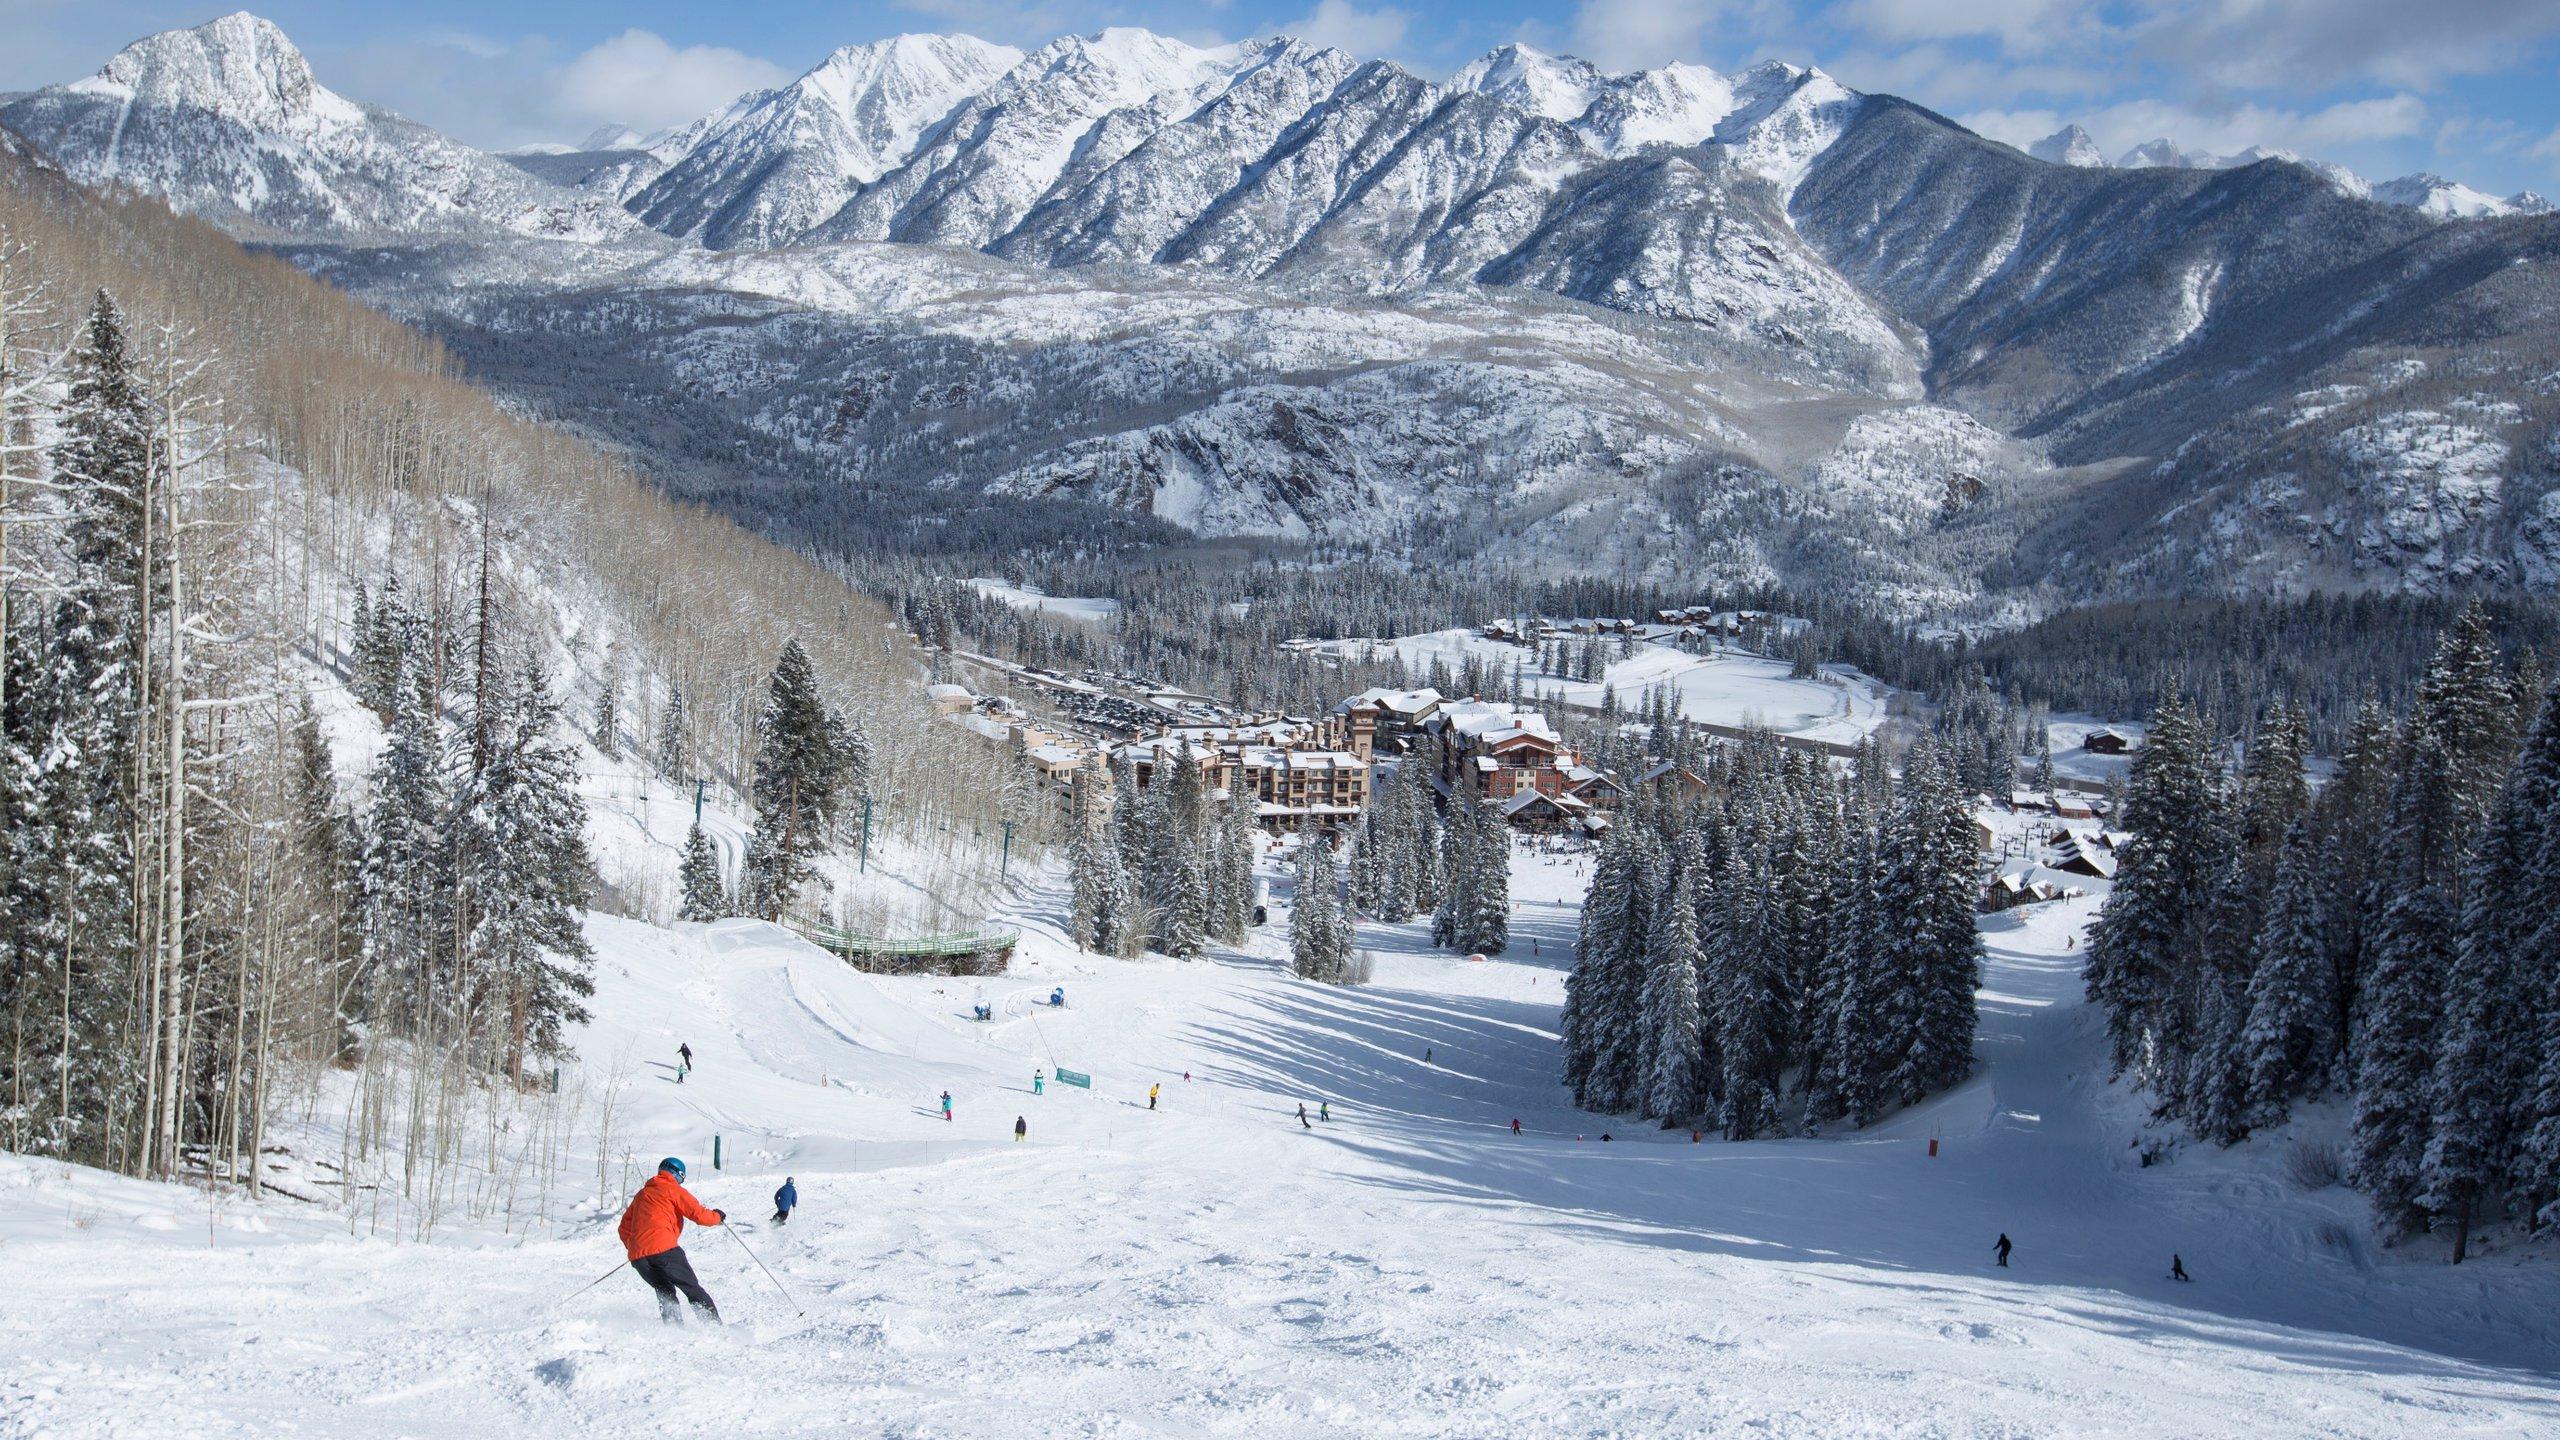 Top 10 Ski Resorts  Lodges in Durango  Purgatory CO 49